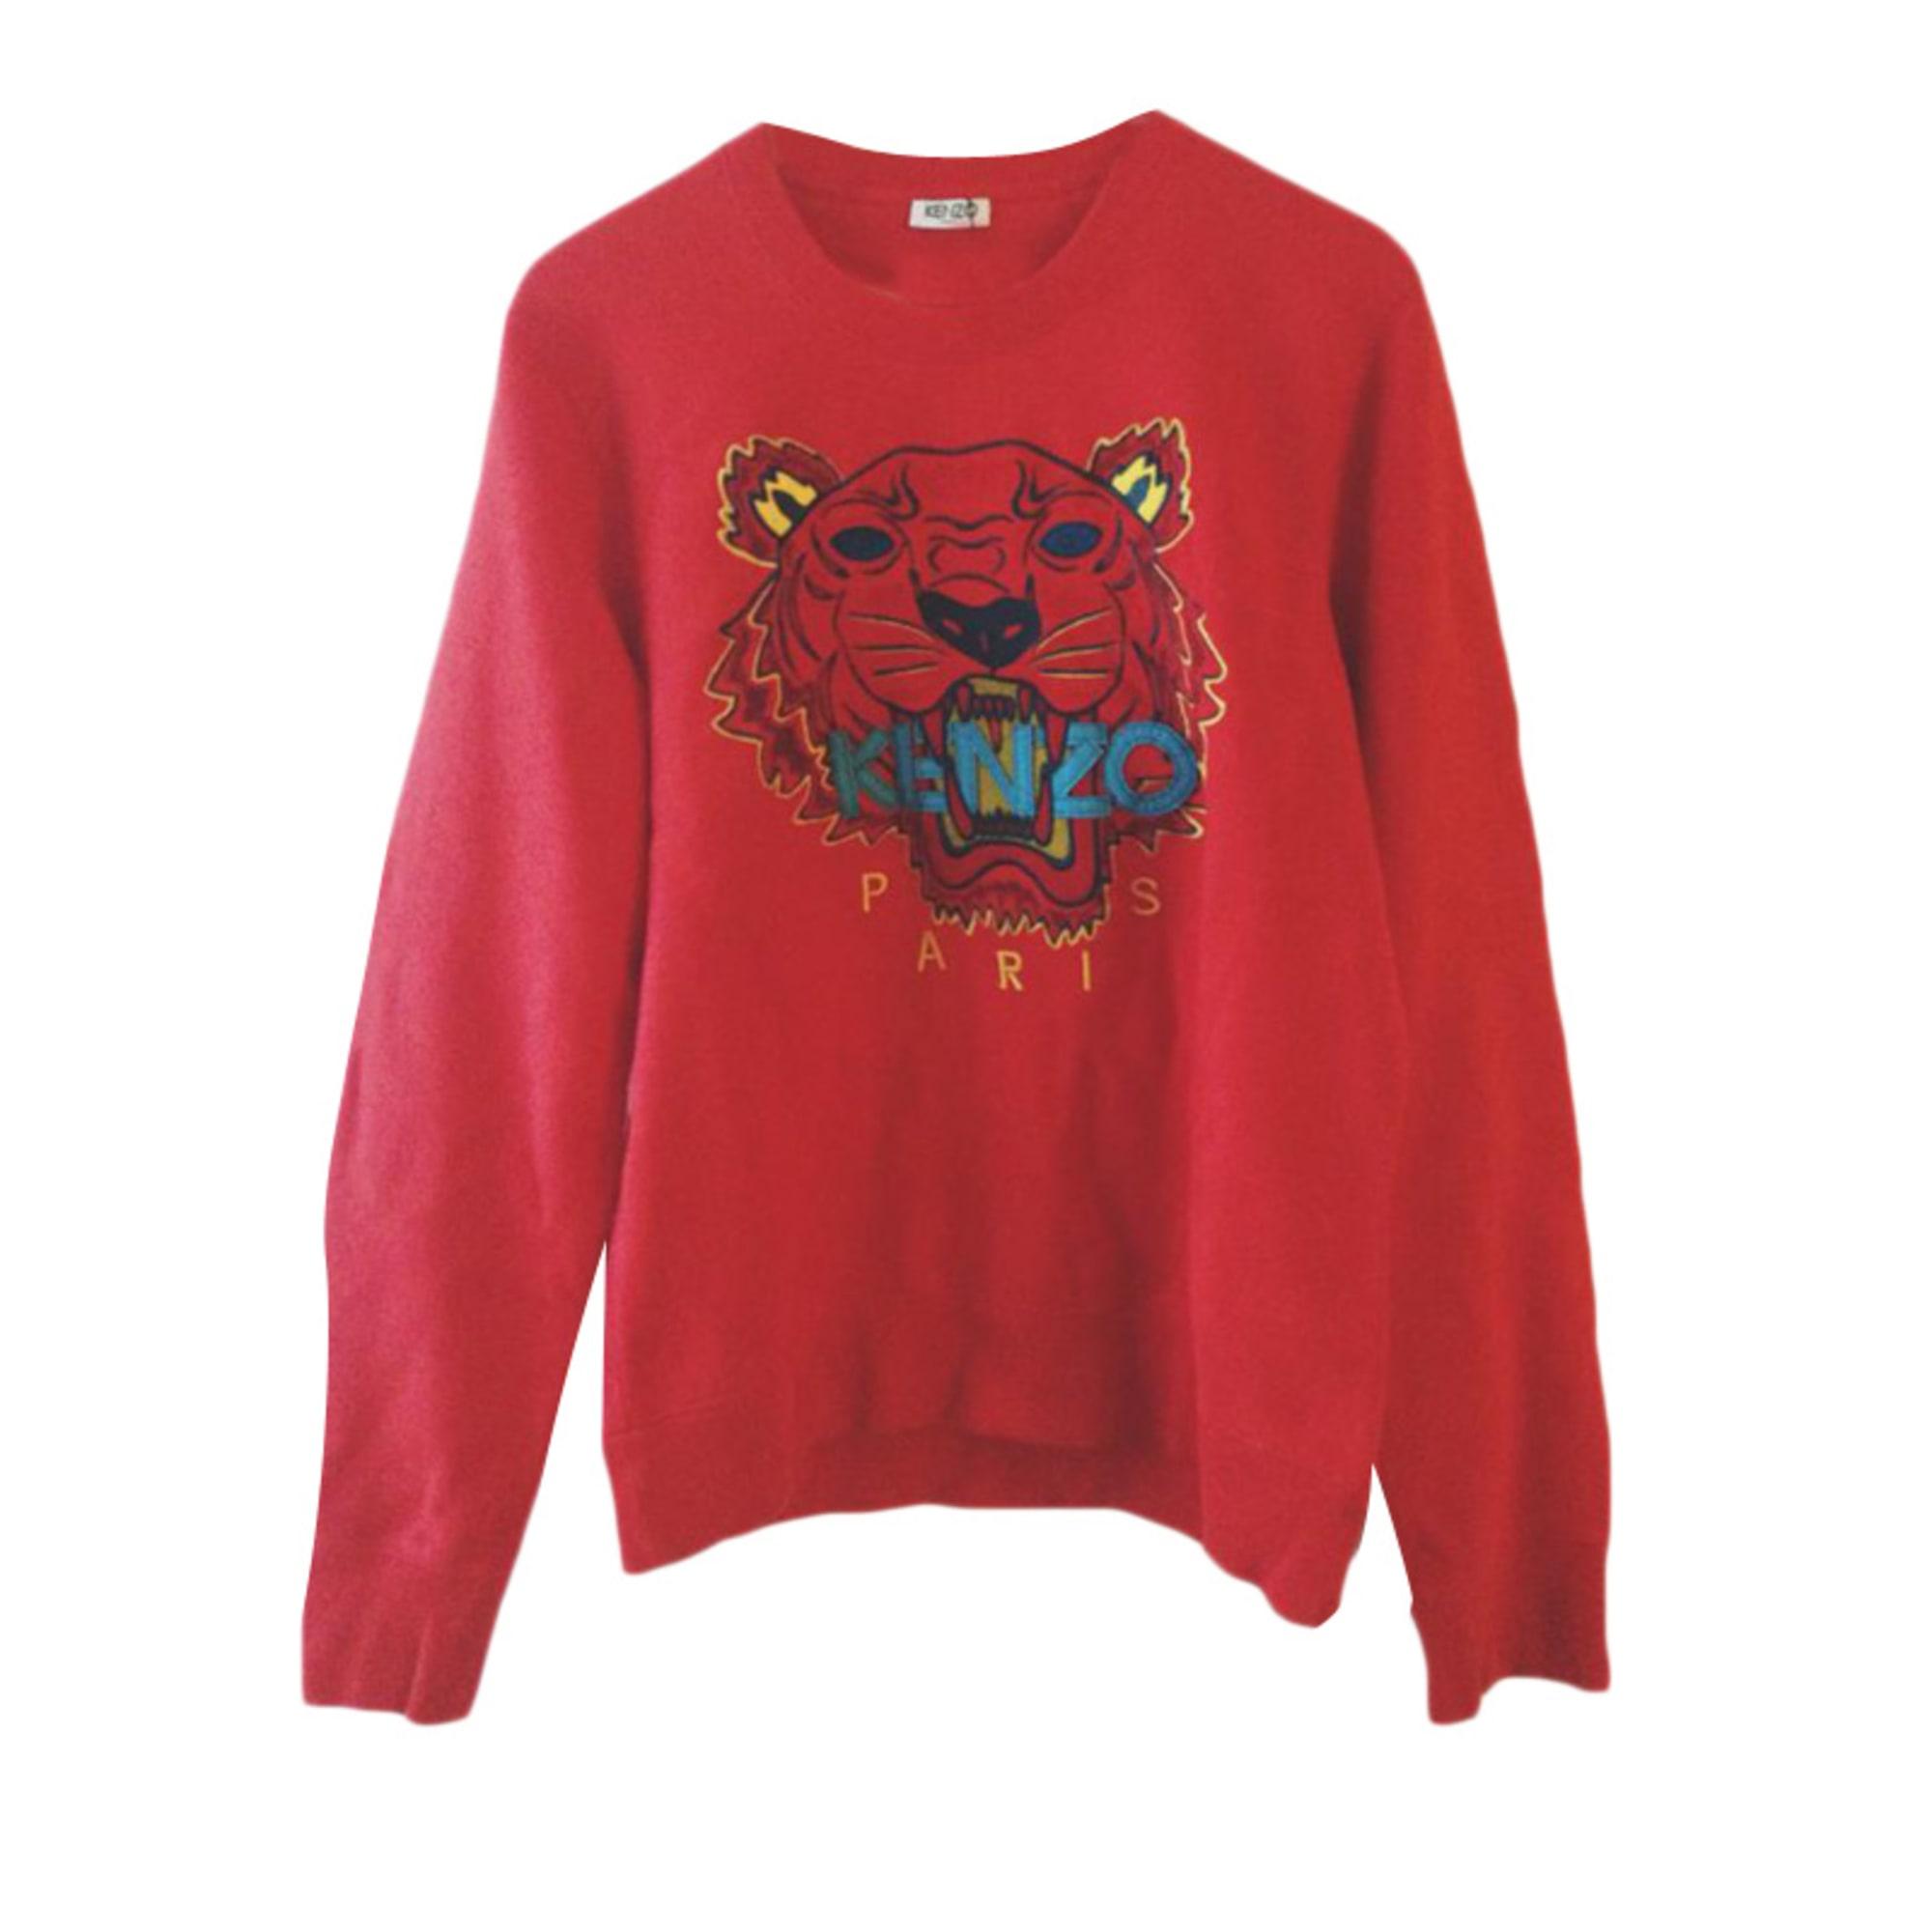 10b3c4b1b65 Sweat KENZO 2 (M) rouge vendu par Thomas 557659 - 3193540